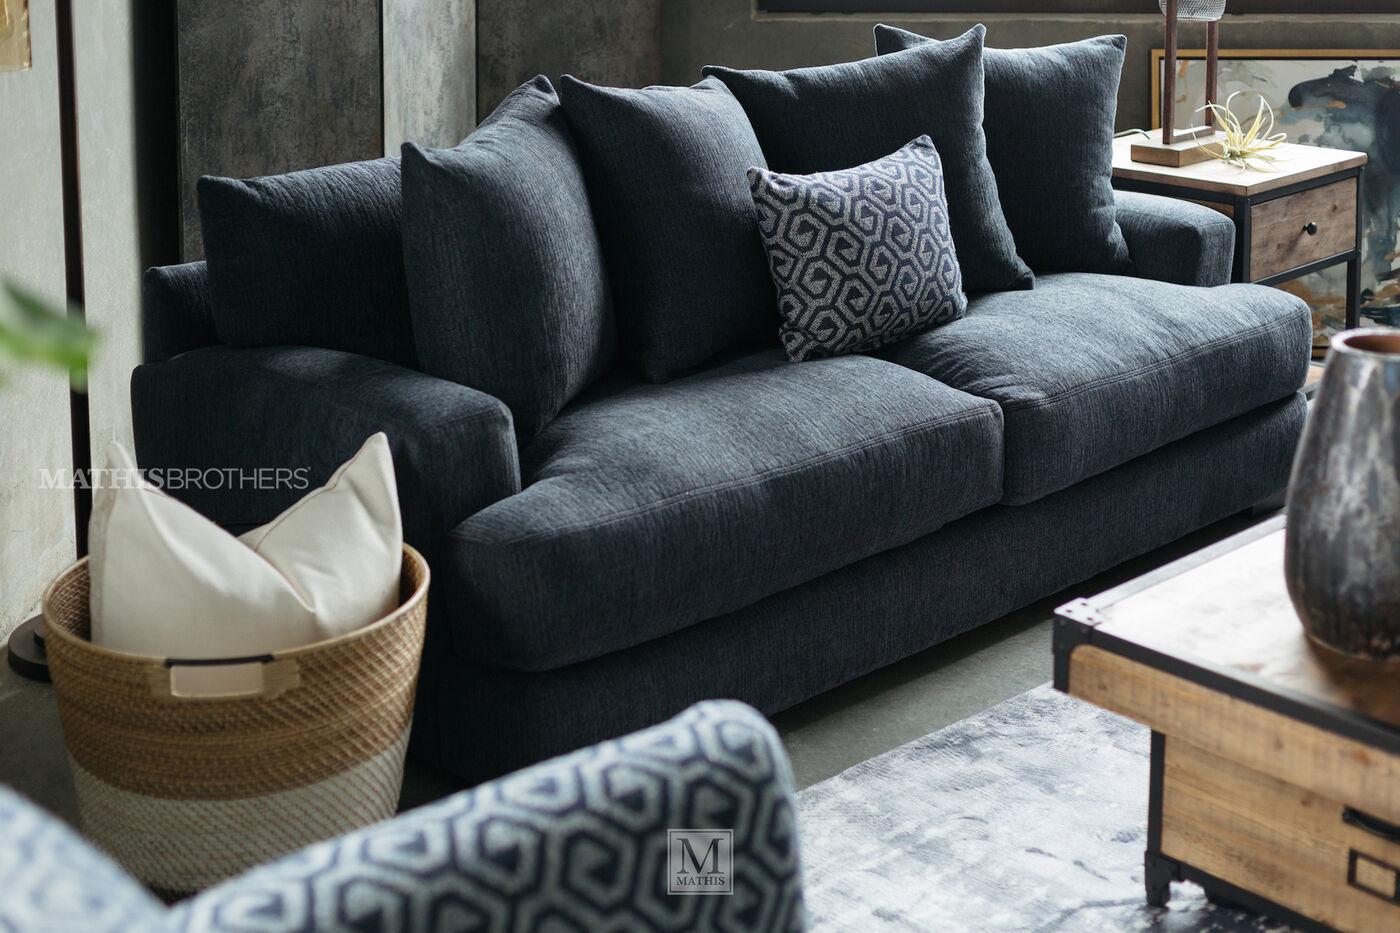 denim living room furniture. Jonathan Louis Plush 87  Sofa in Denim 360 spin Carlin Mathis Brothers Furniture